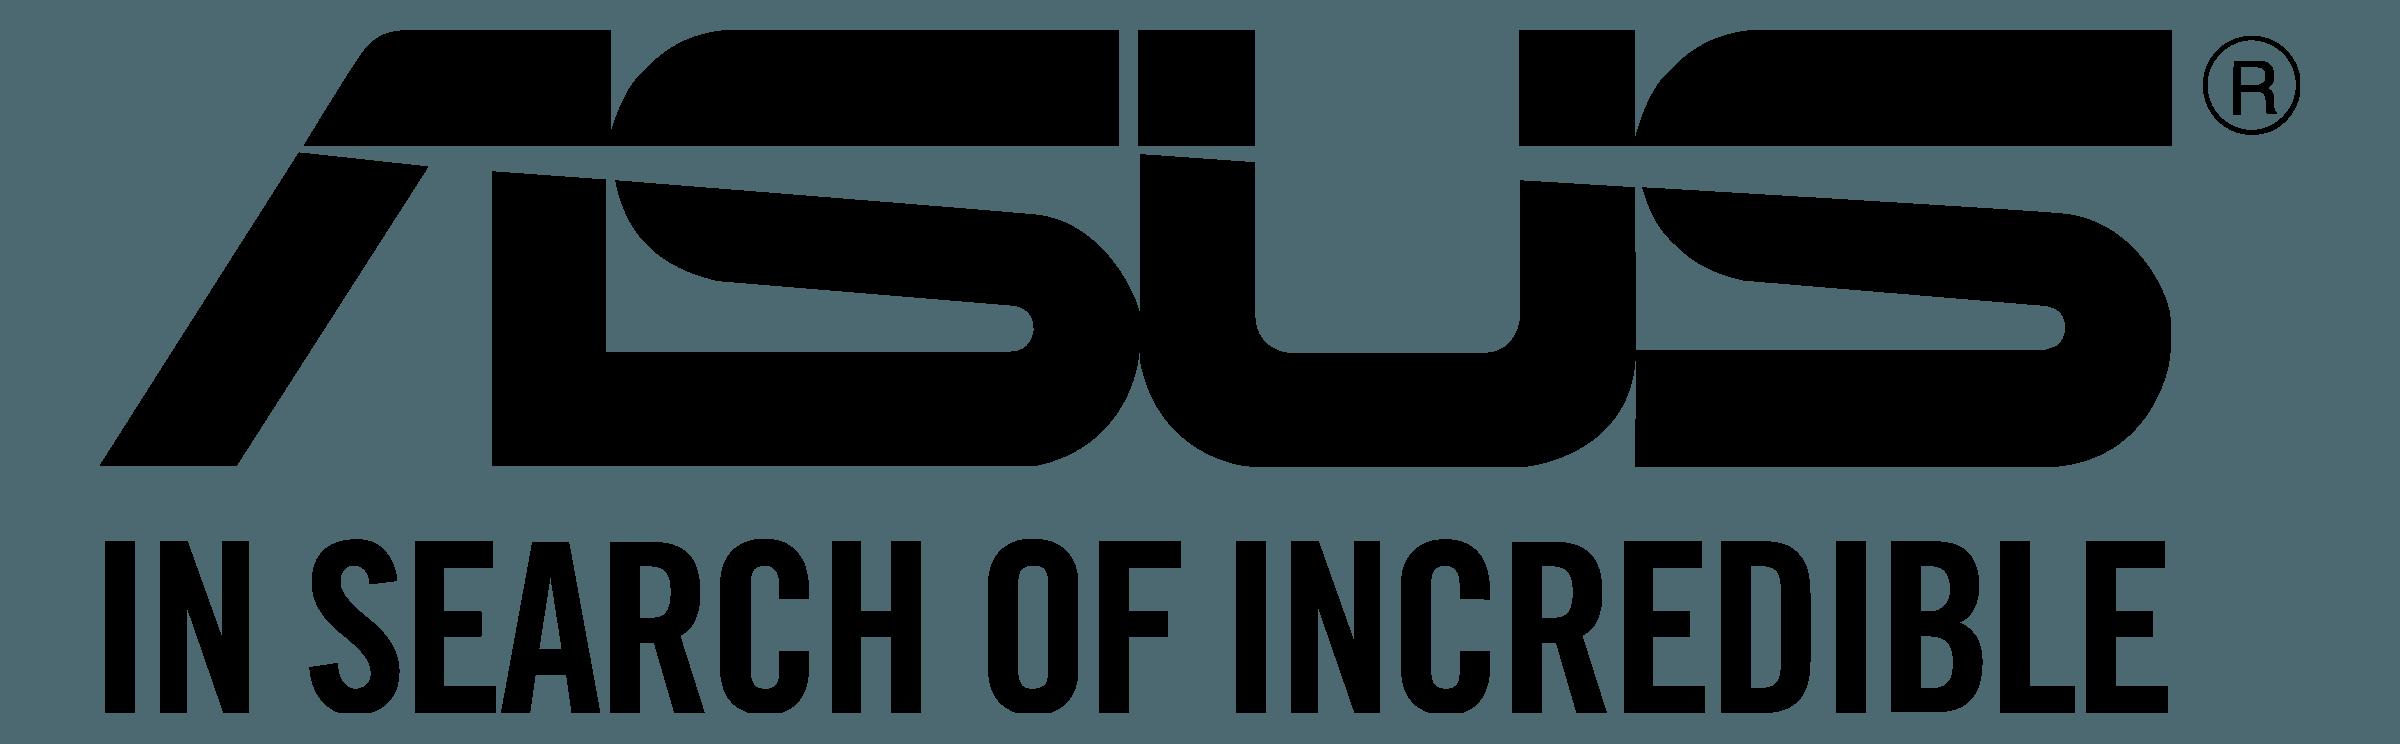 Asus Logo PNG Transparent & SVG Vector.